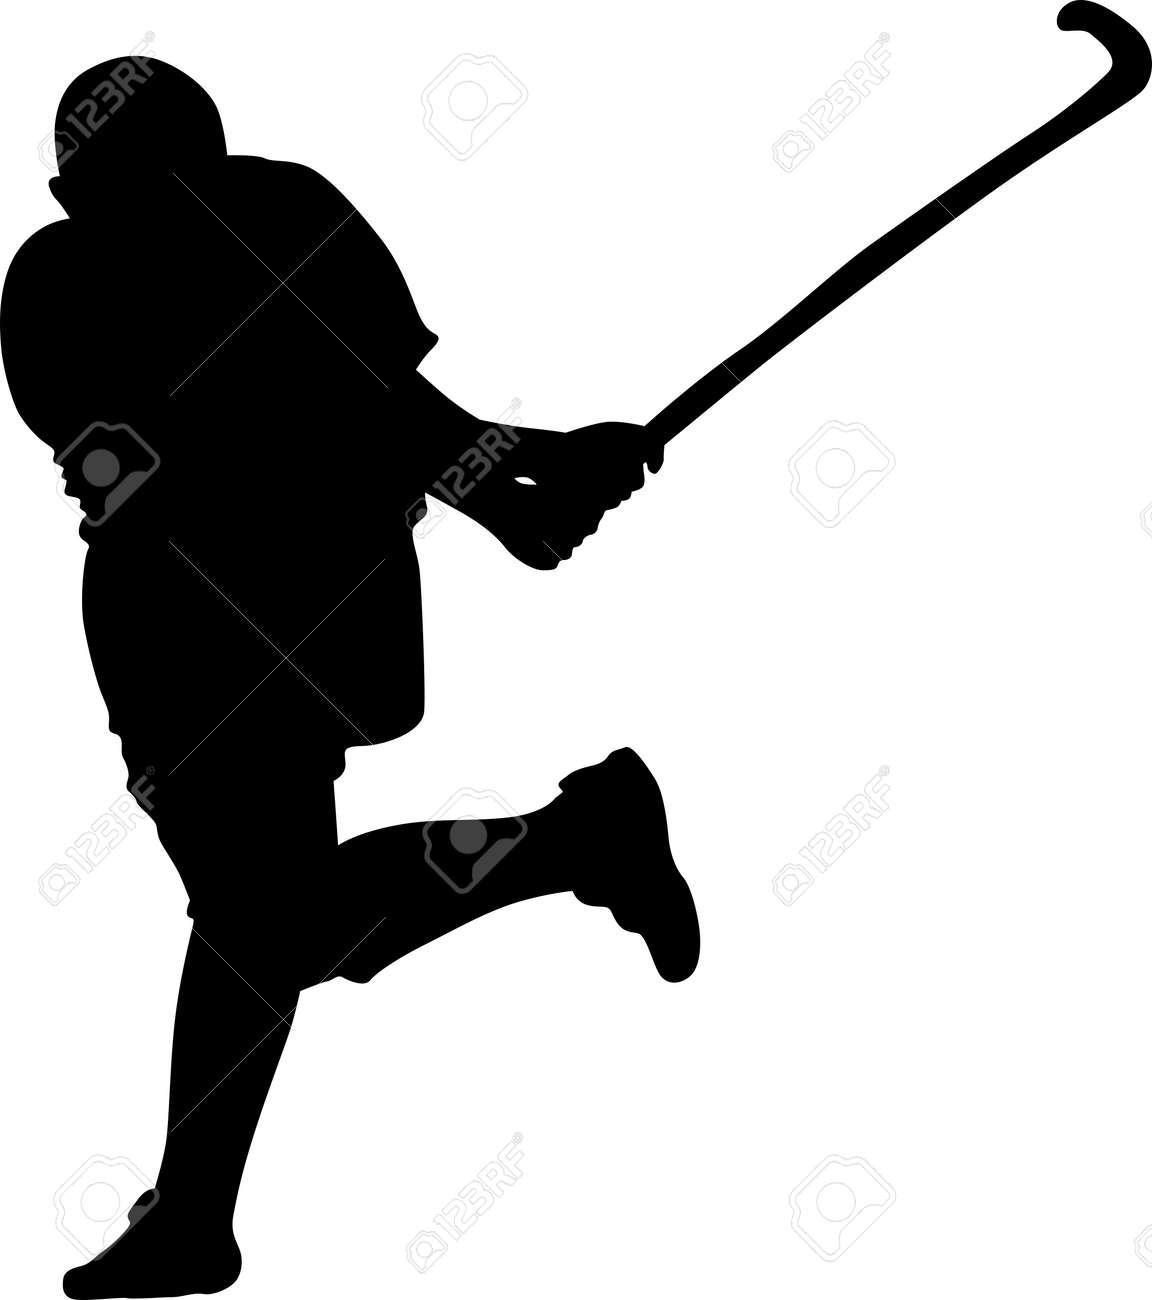 Field Hockey Silhouette on white background - stock vector | Field hockey,  Hockey posters, Hockey inspiration